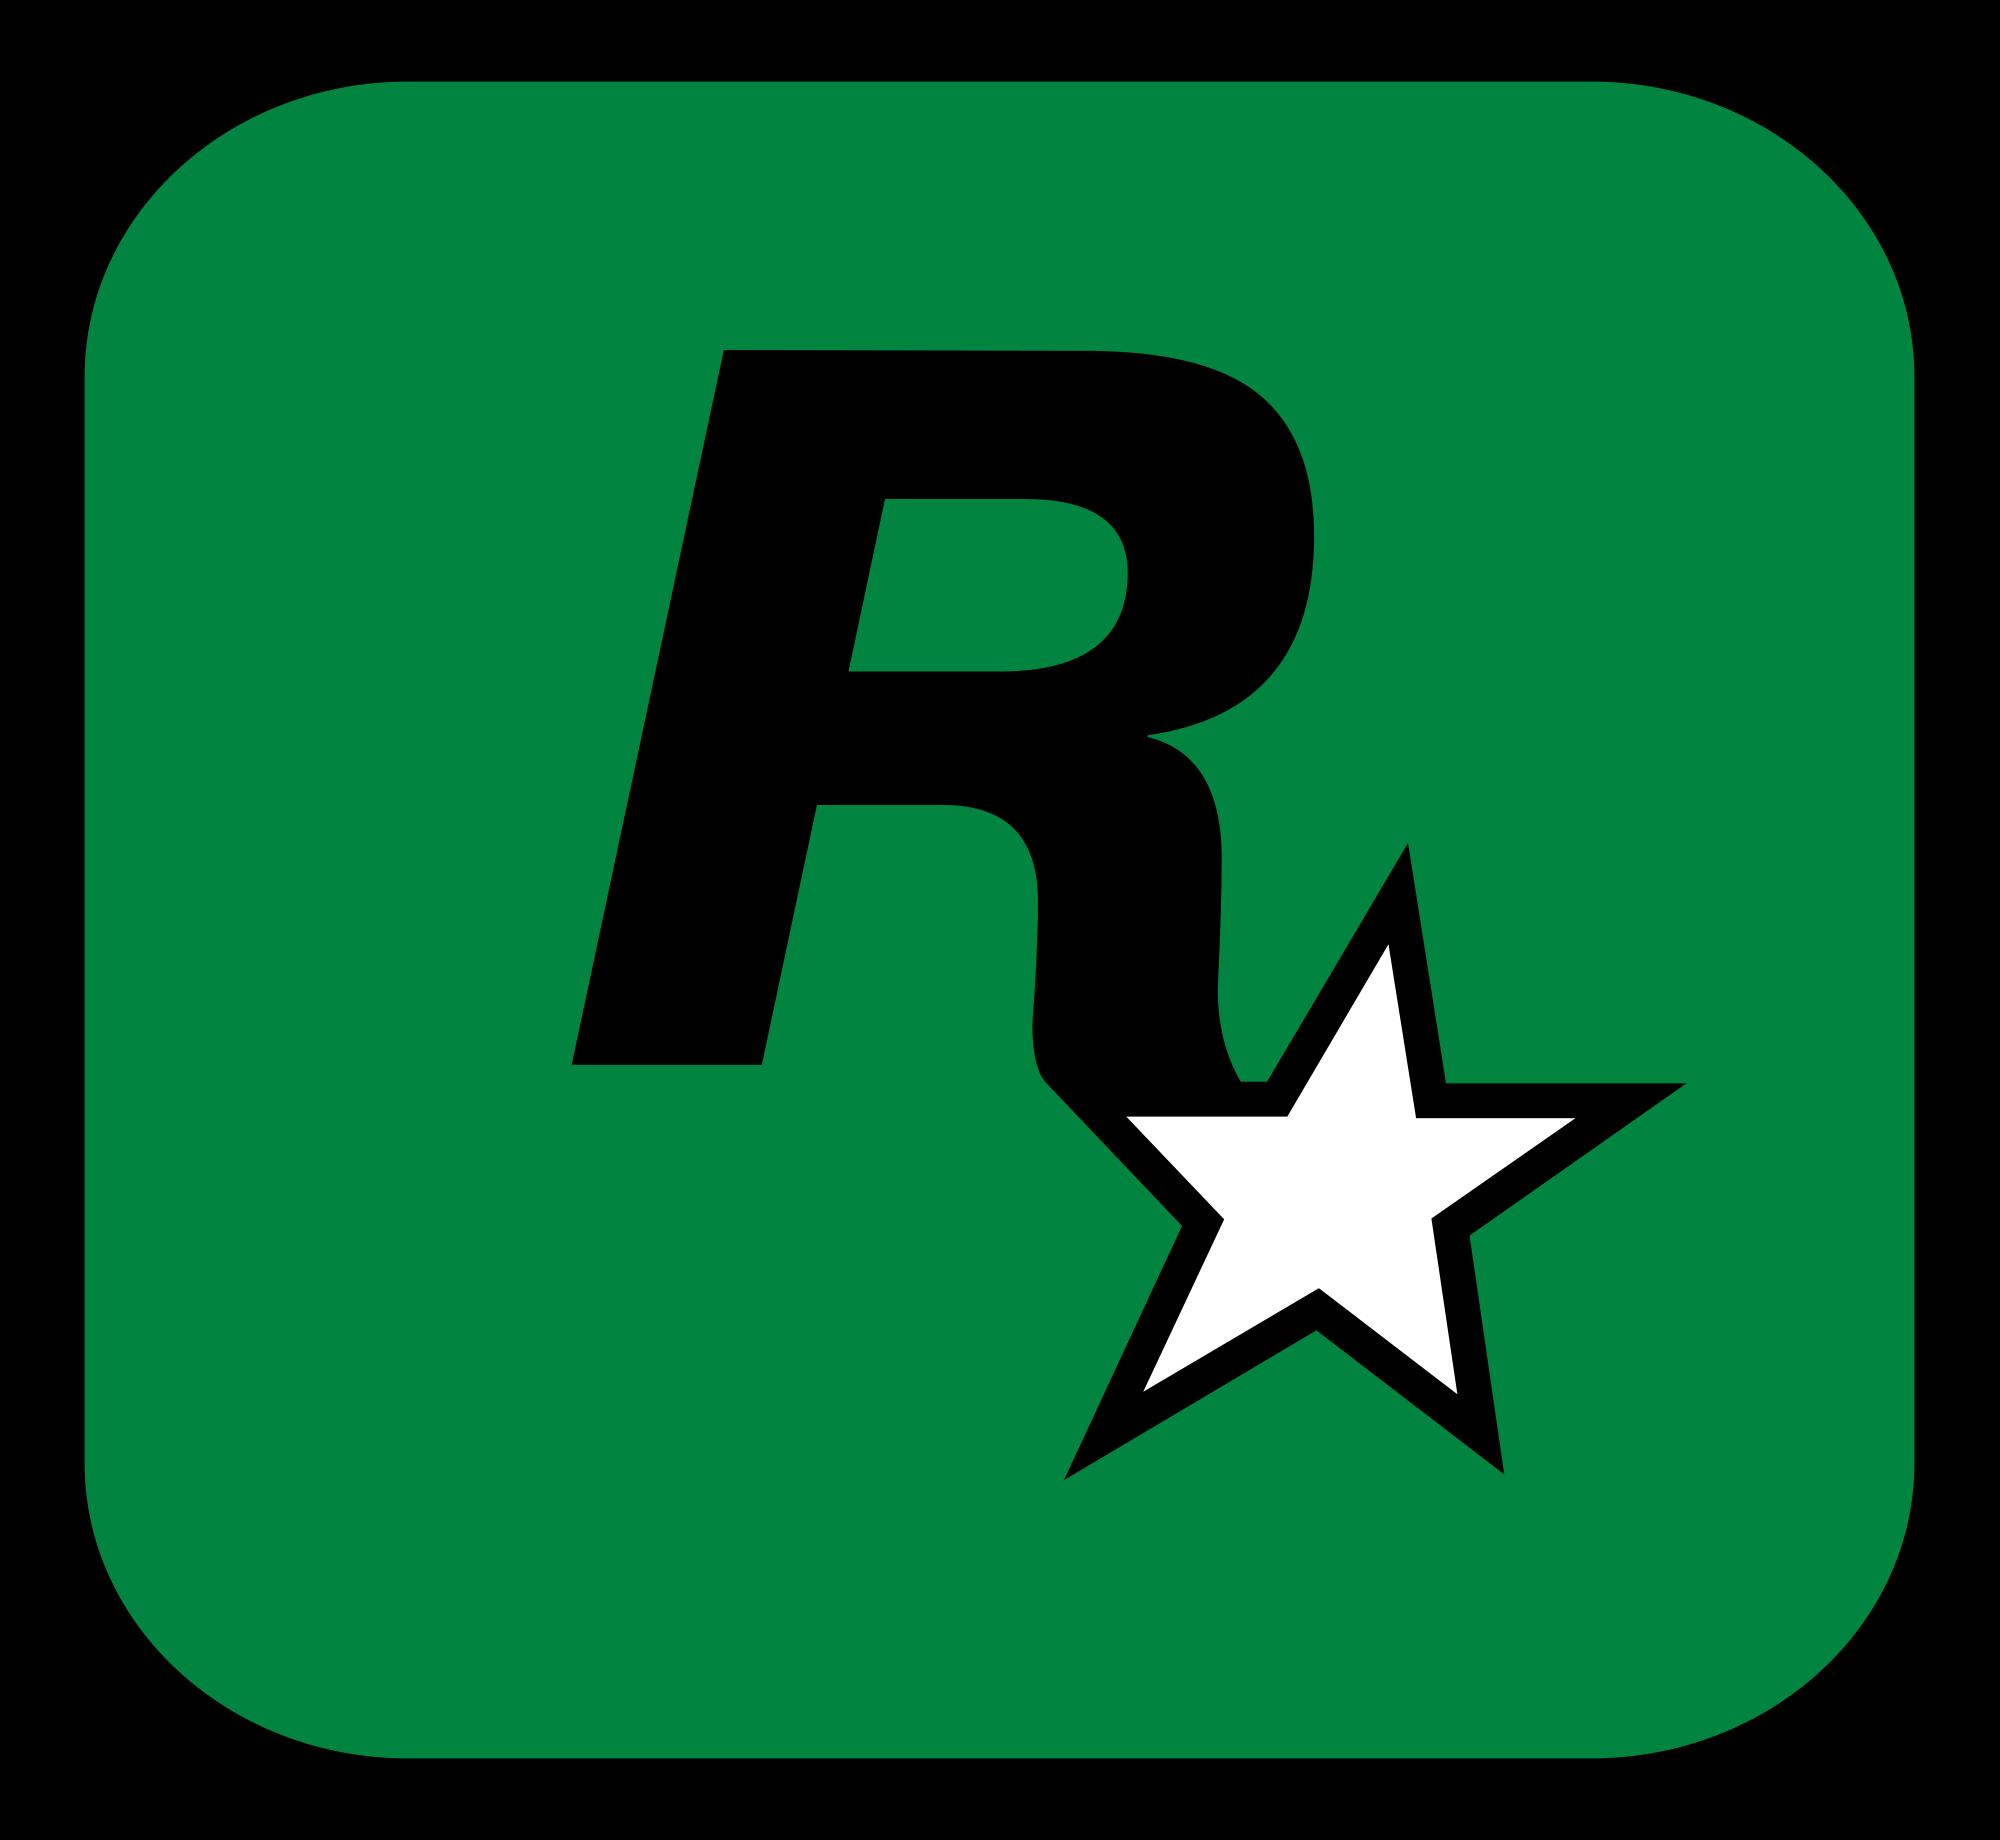 Rockstar Vancouver Rockstar Games Rockstar Games Logo Video Game Logos